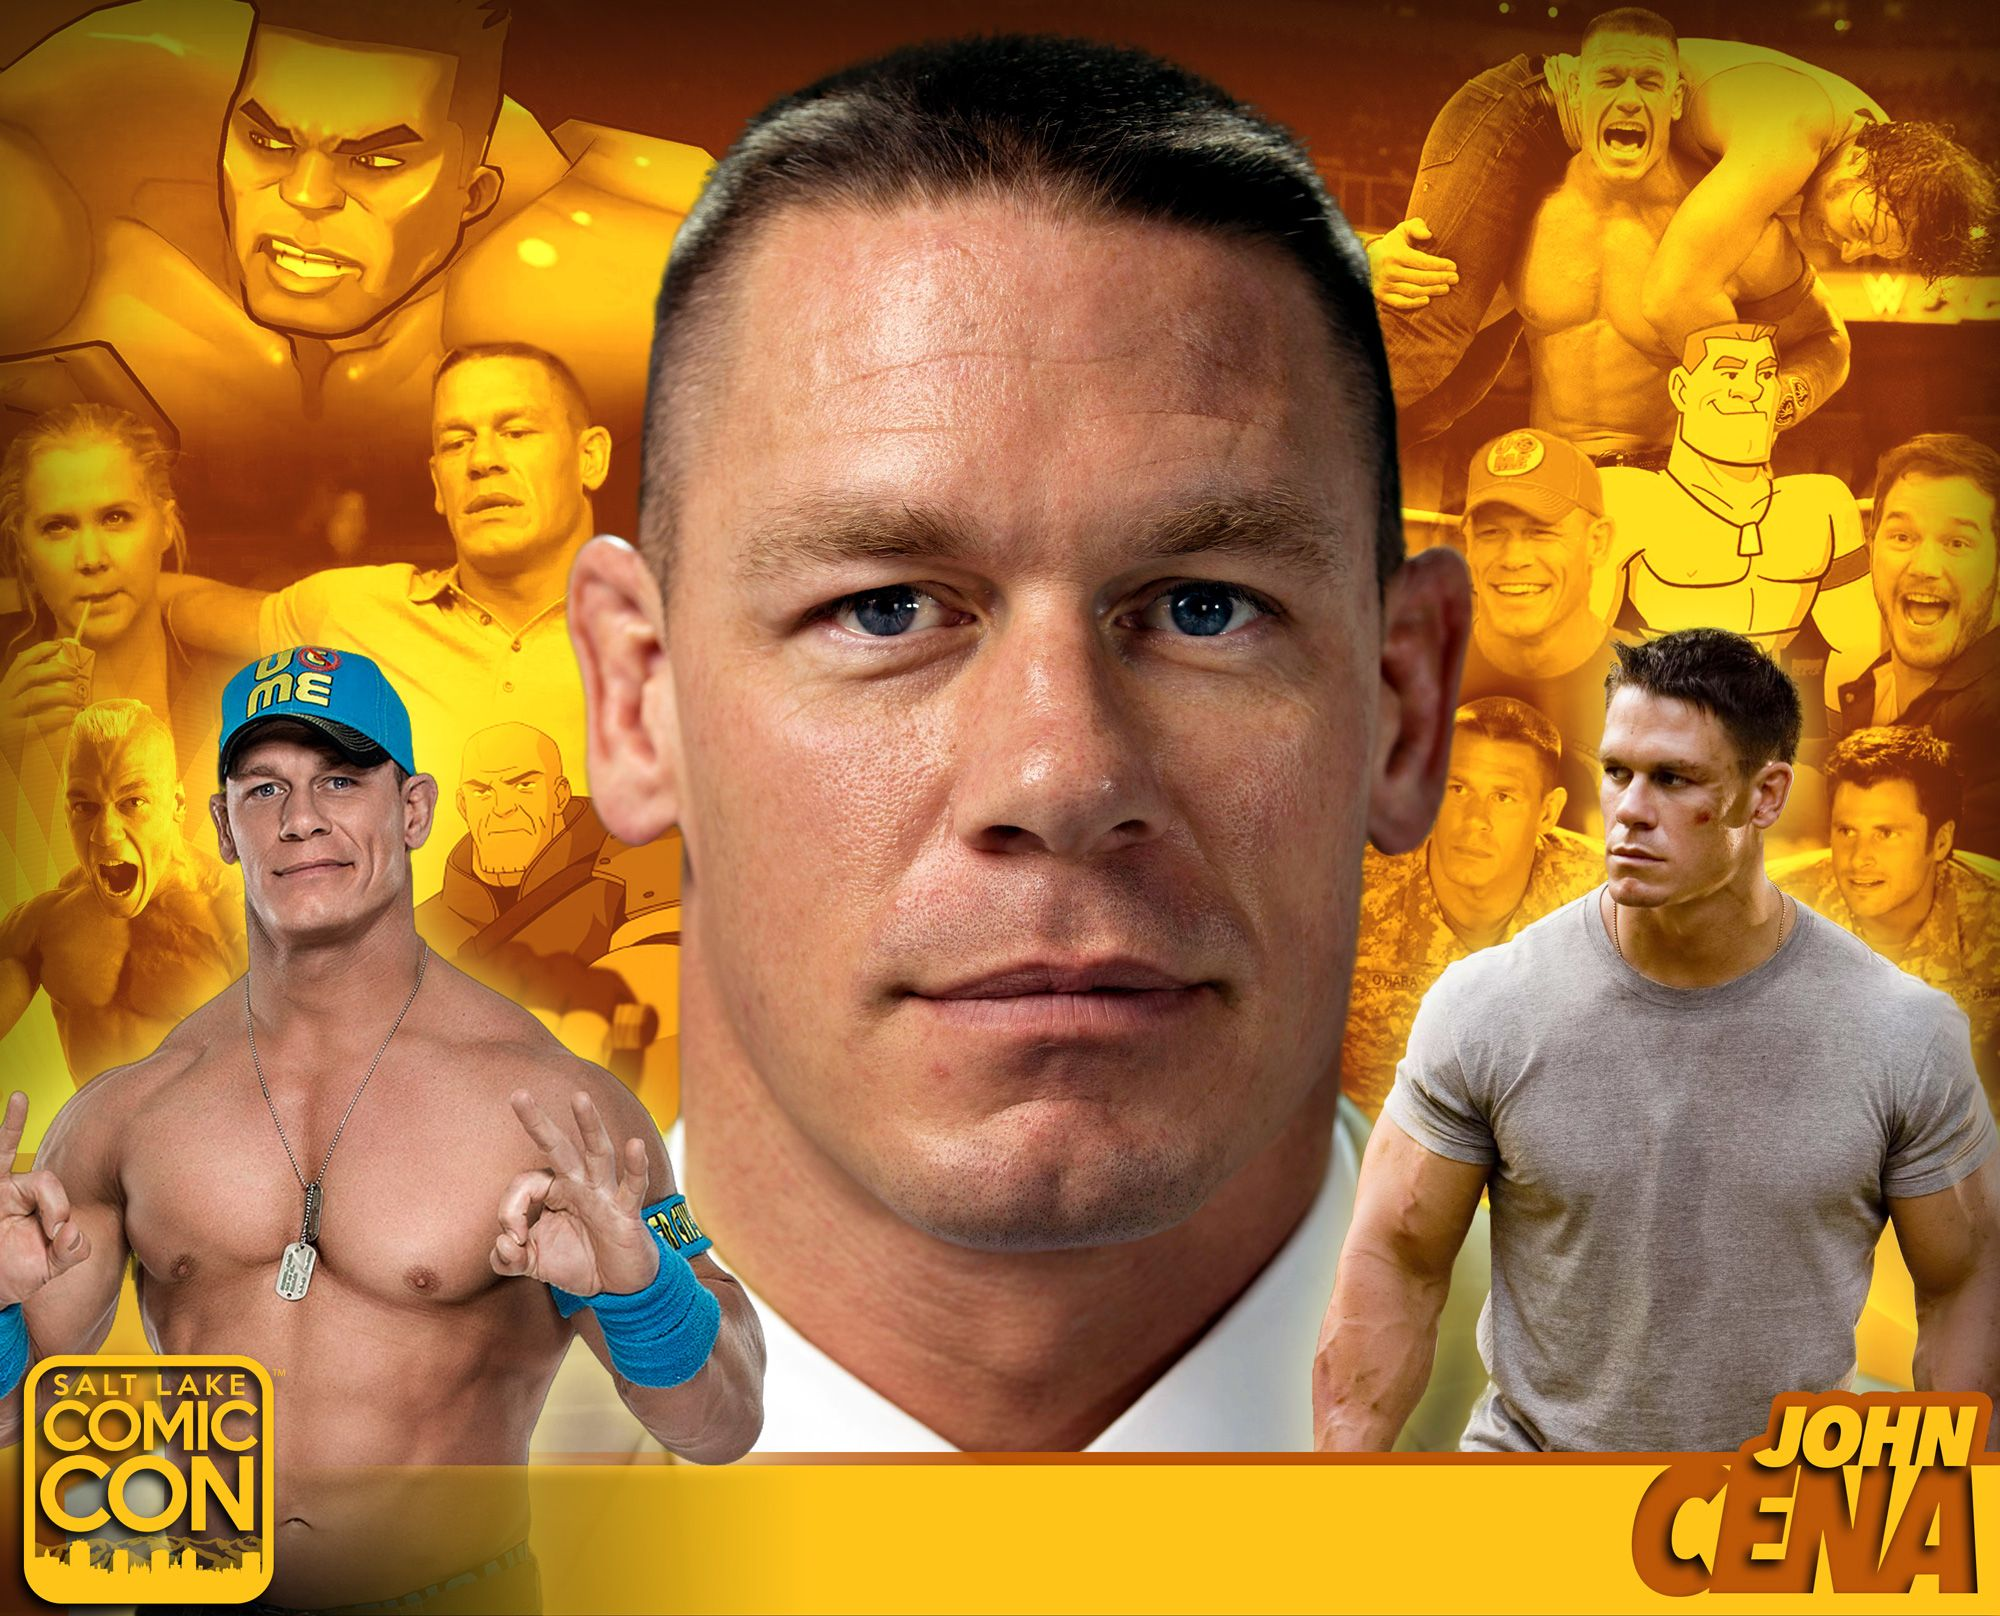 *PIN to WIN* Meet pro wrestler John Cena at #SLCC16! WWE SmackDown Live…